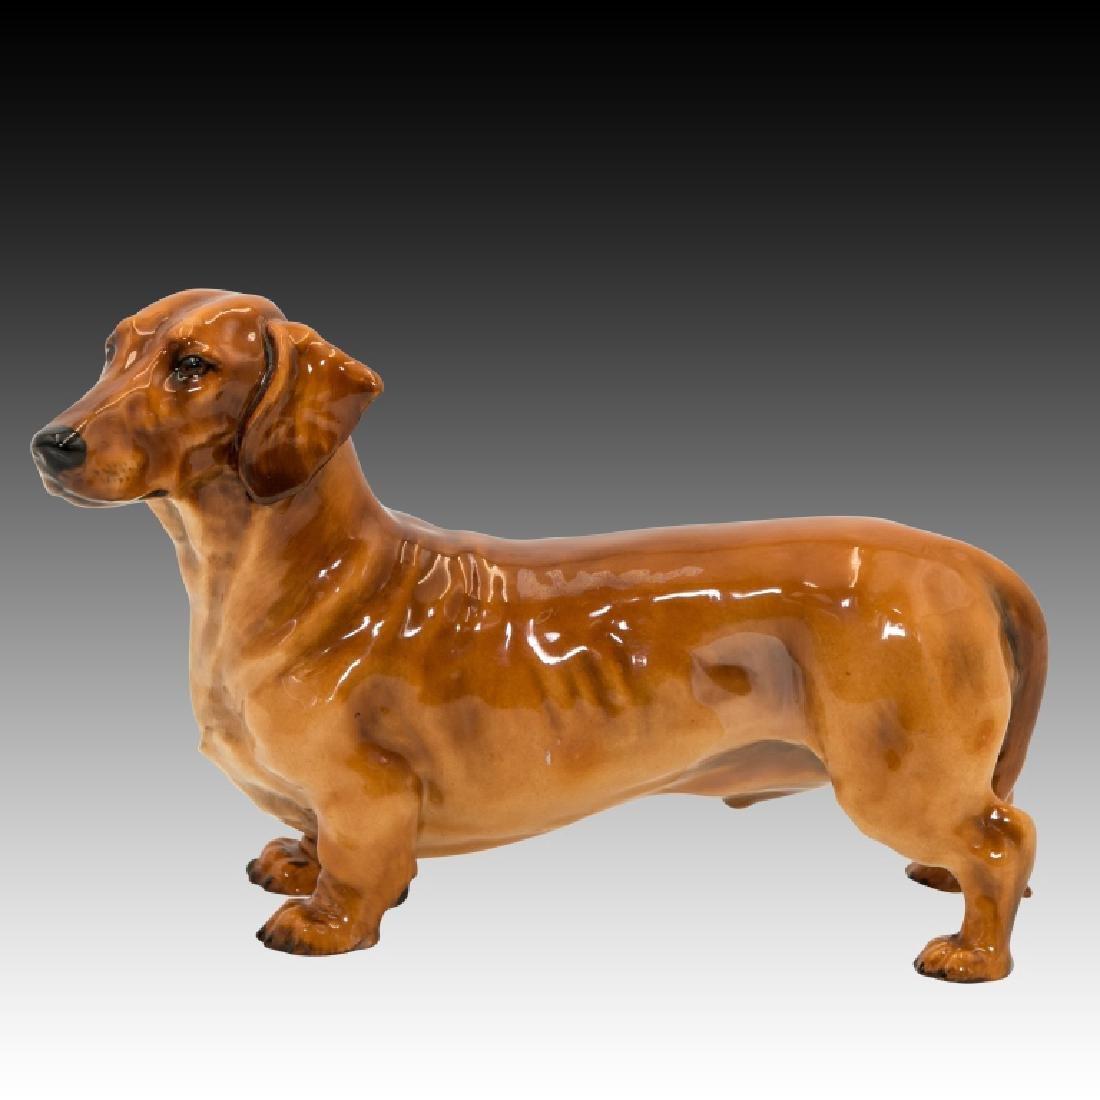 Royal Doulton Dachshund Standing Dog HN1139